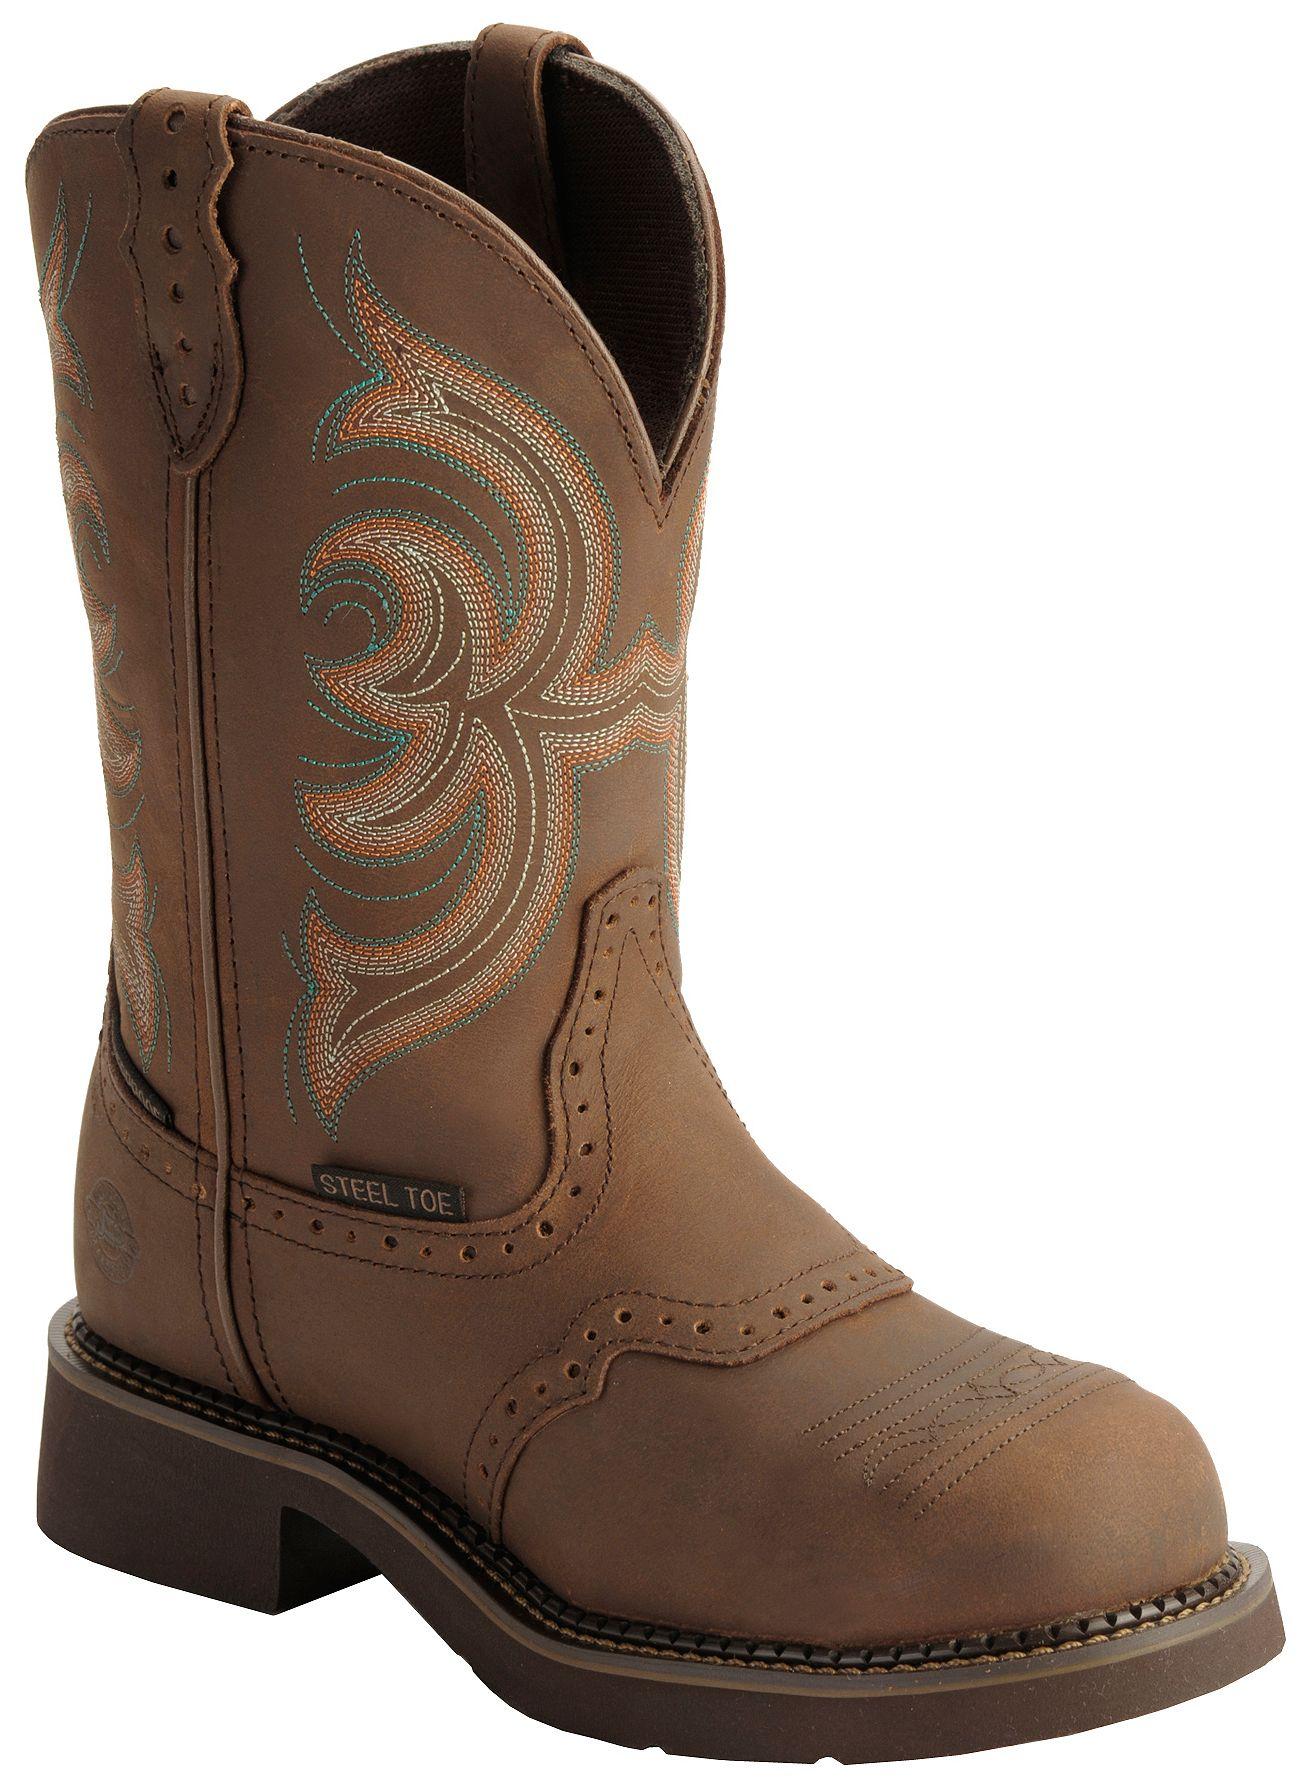 Justin Gypsy Waterproof Work Boots Round Steel Toe